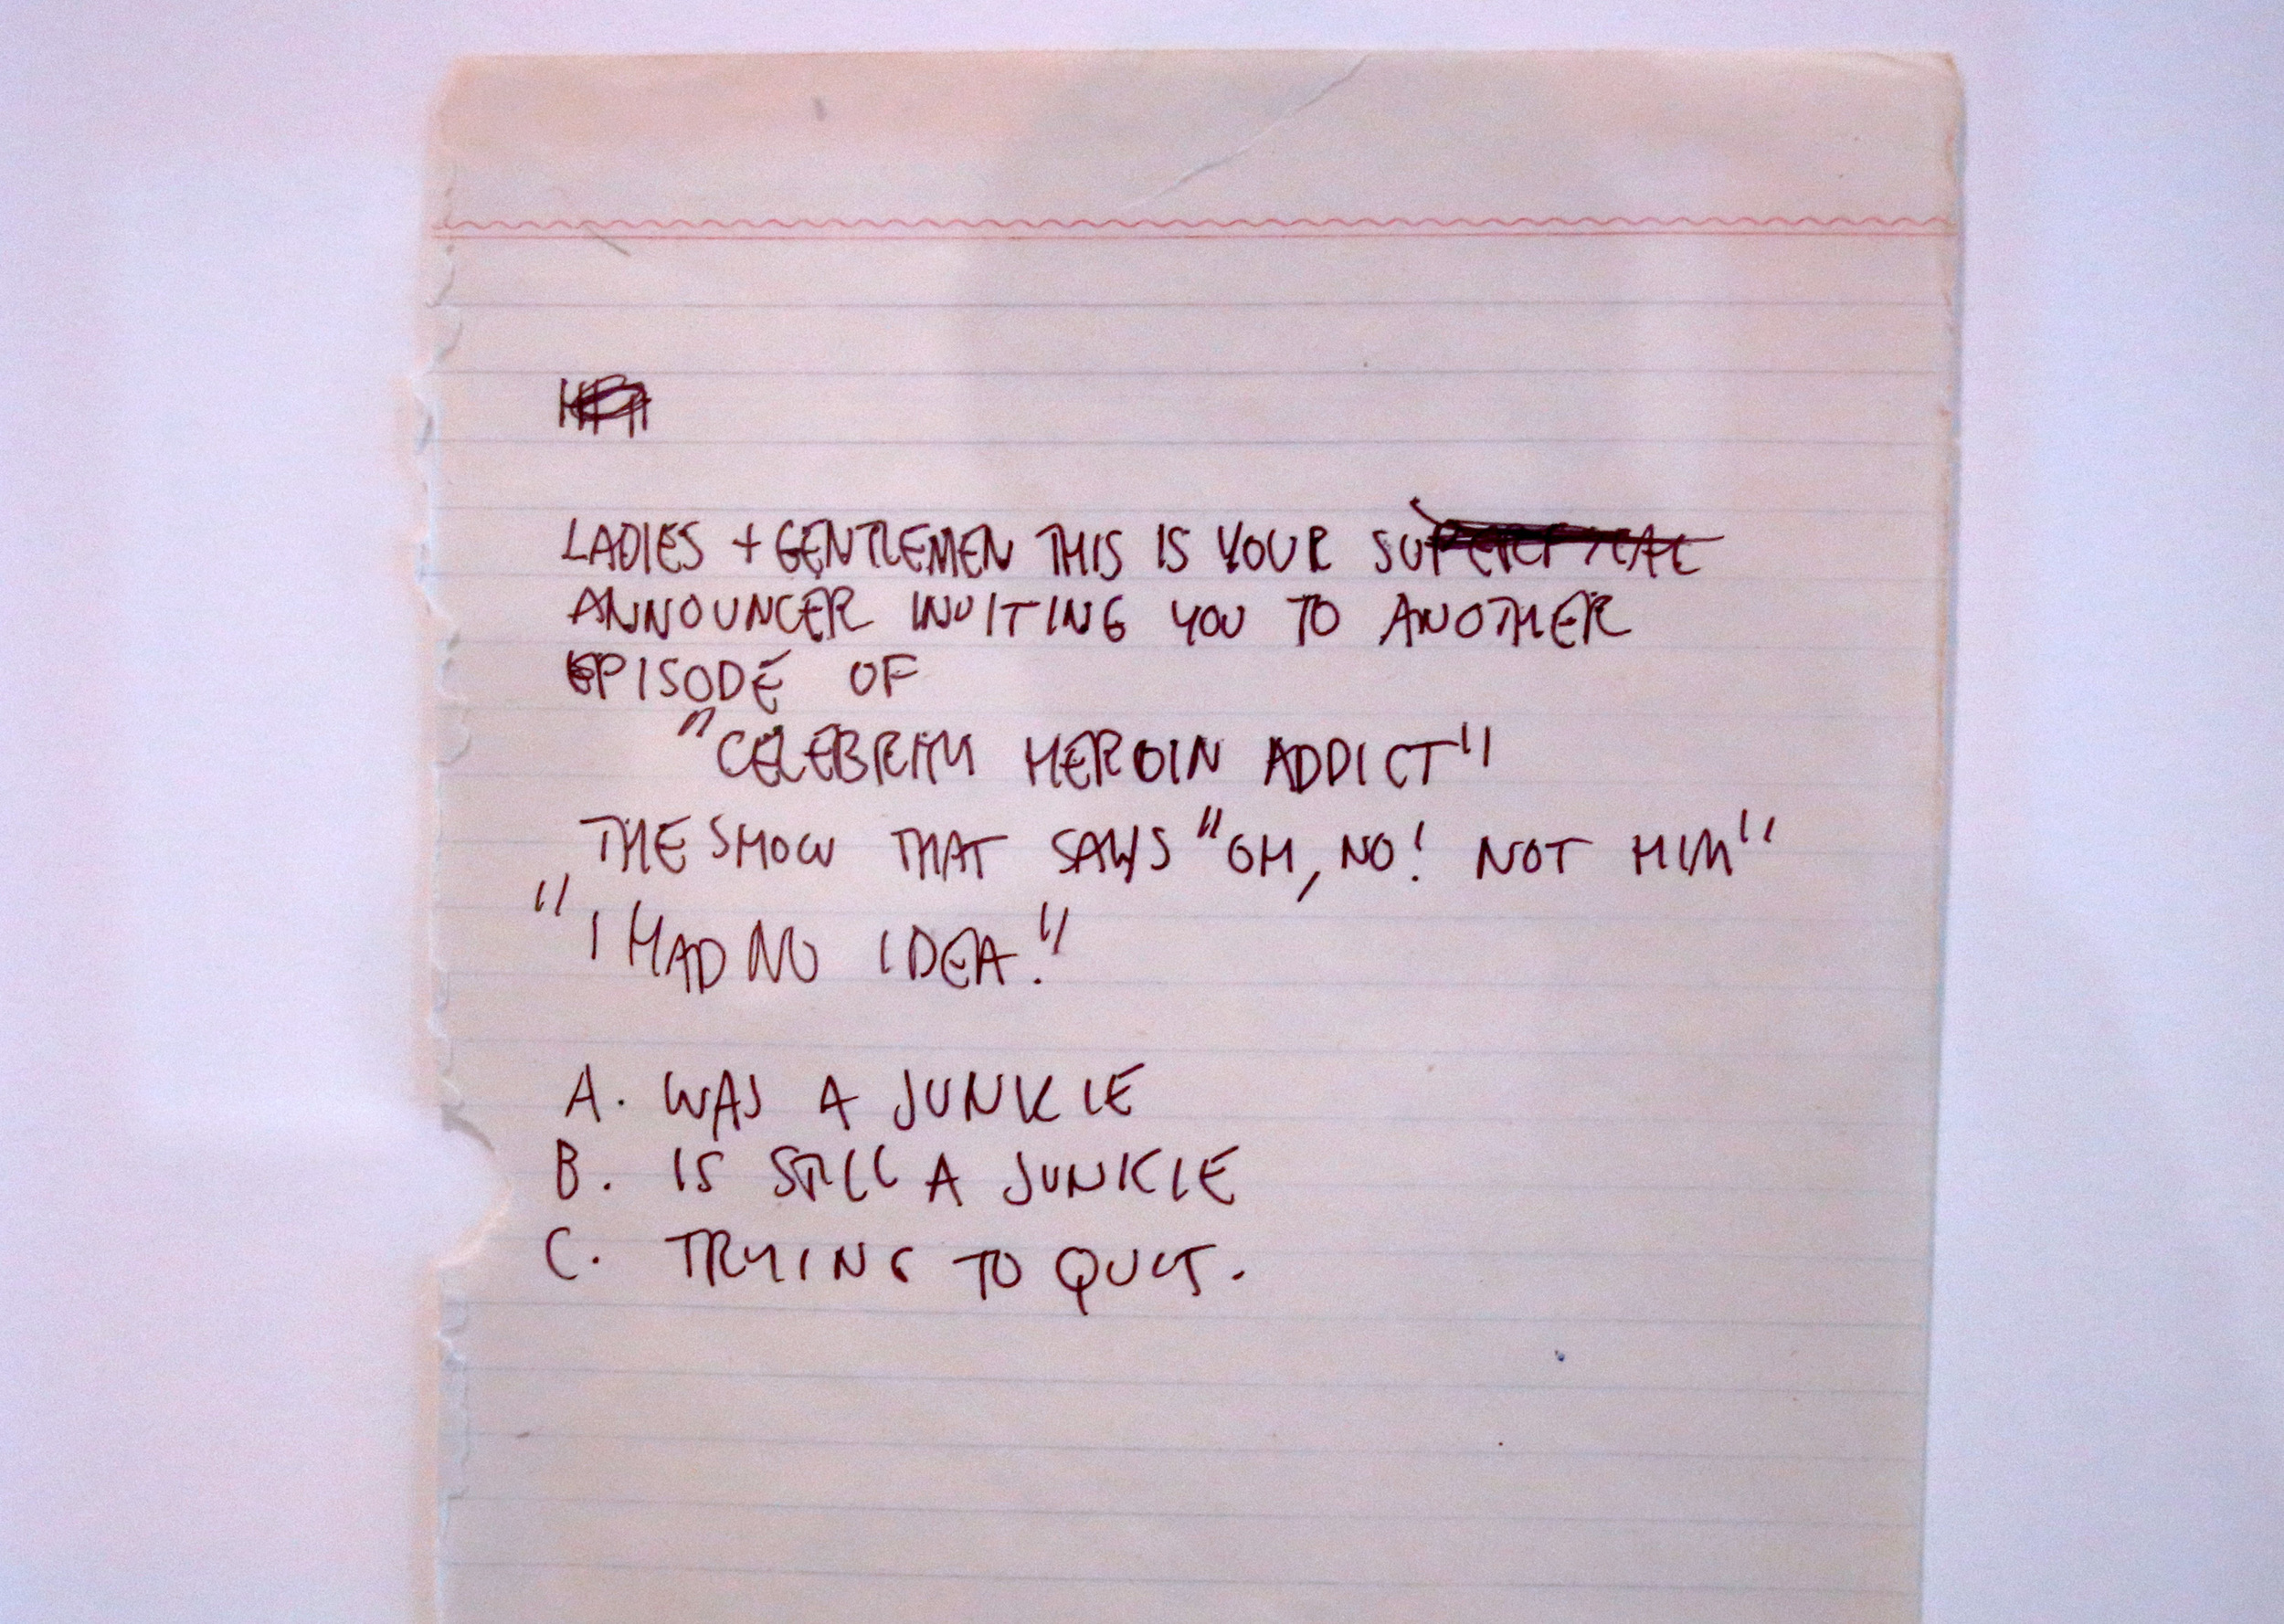 basquiat7.jpg